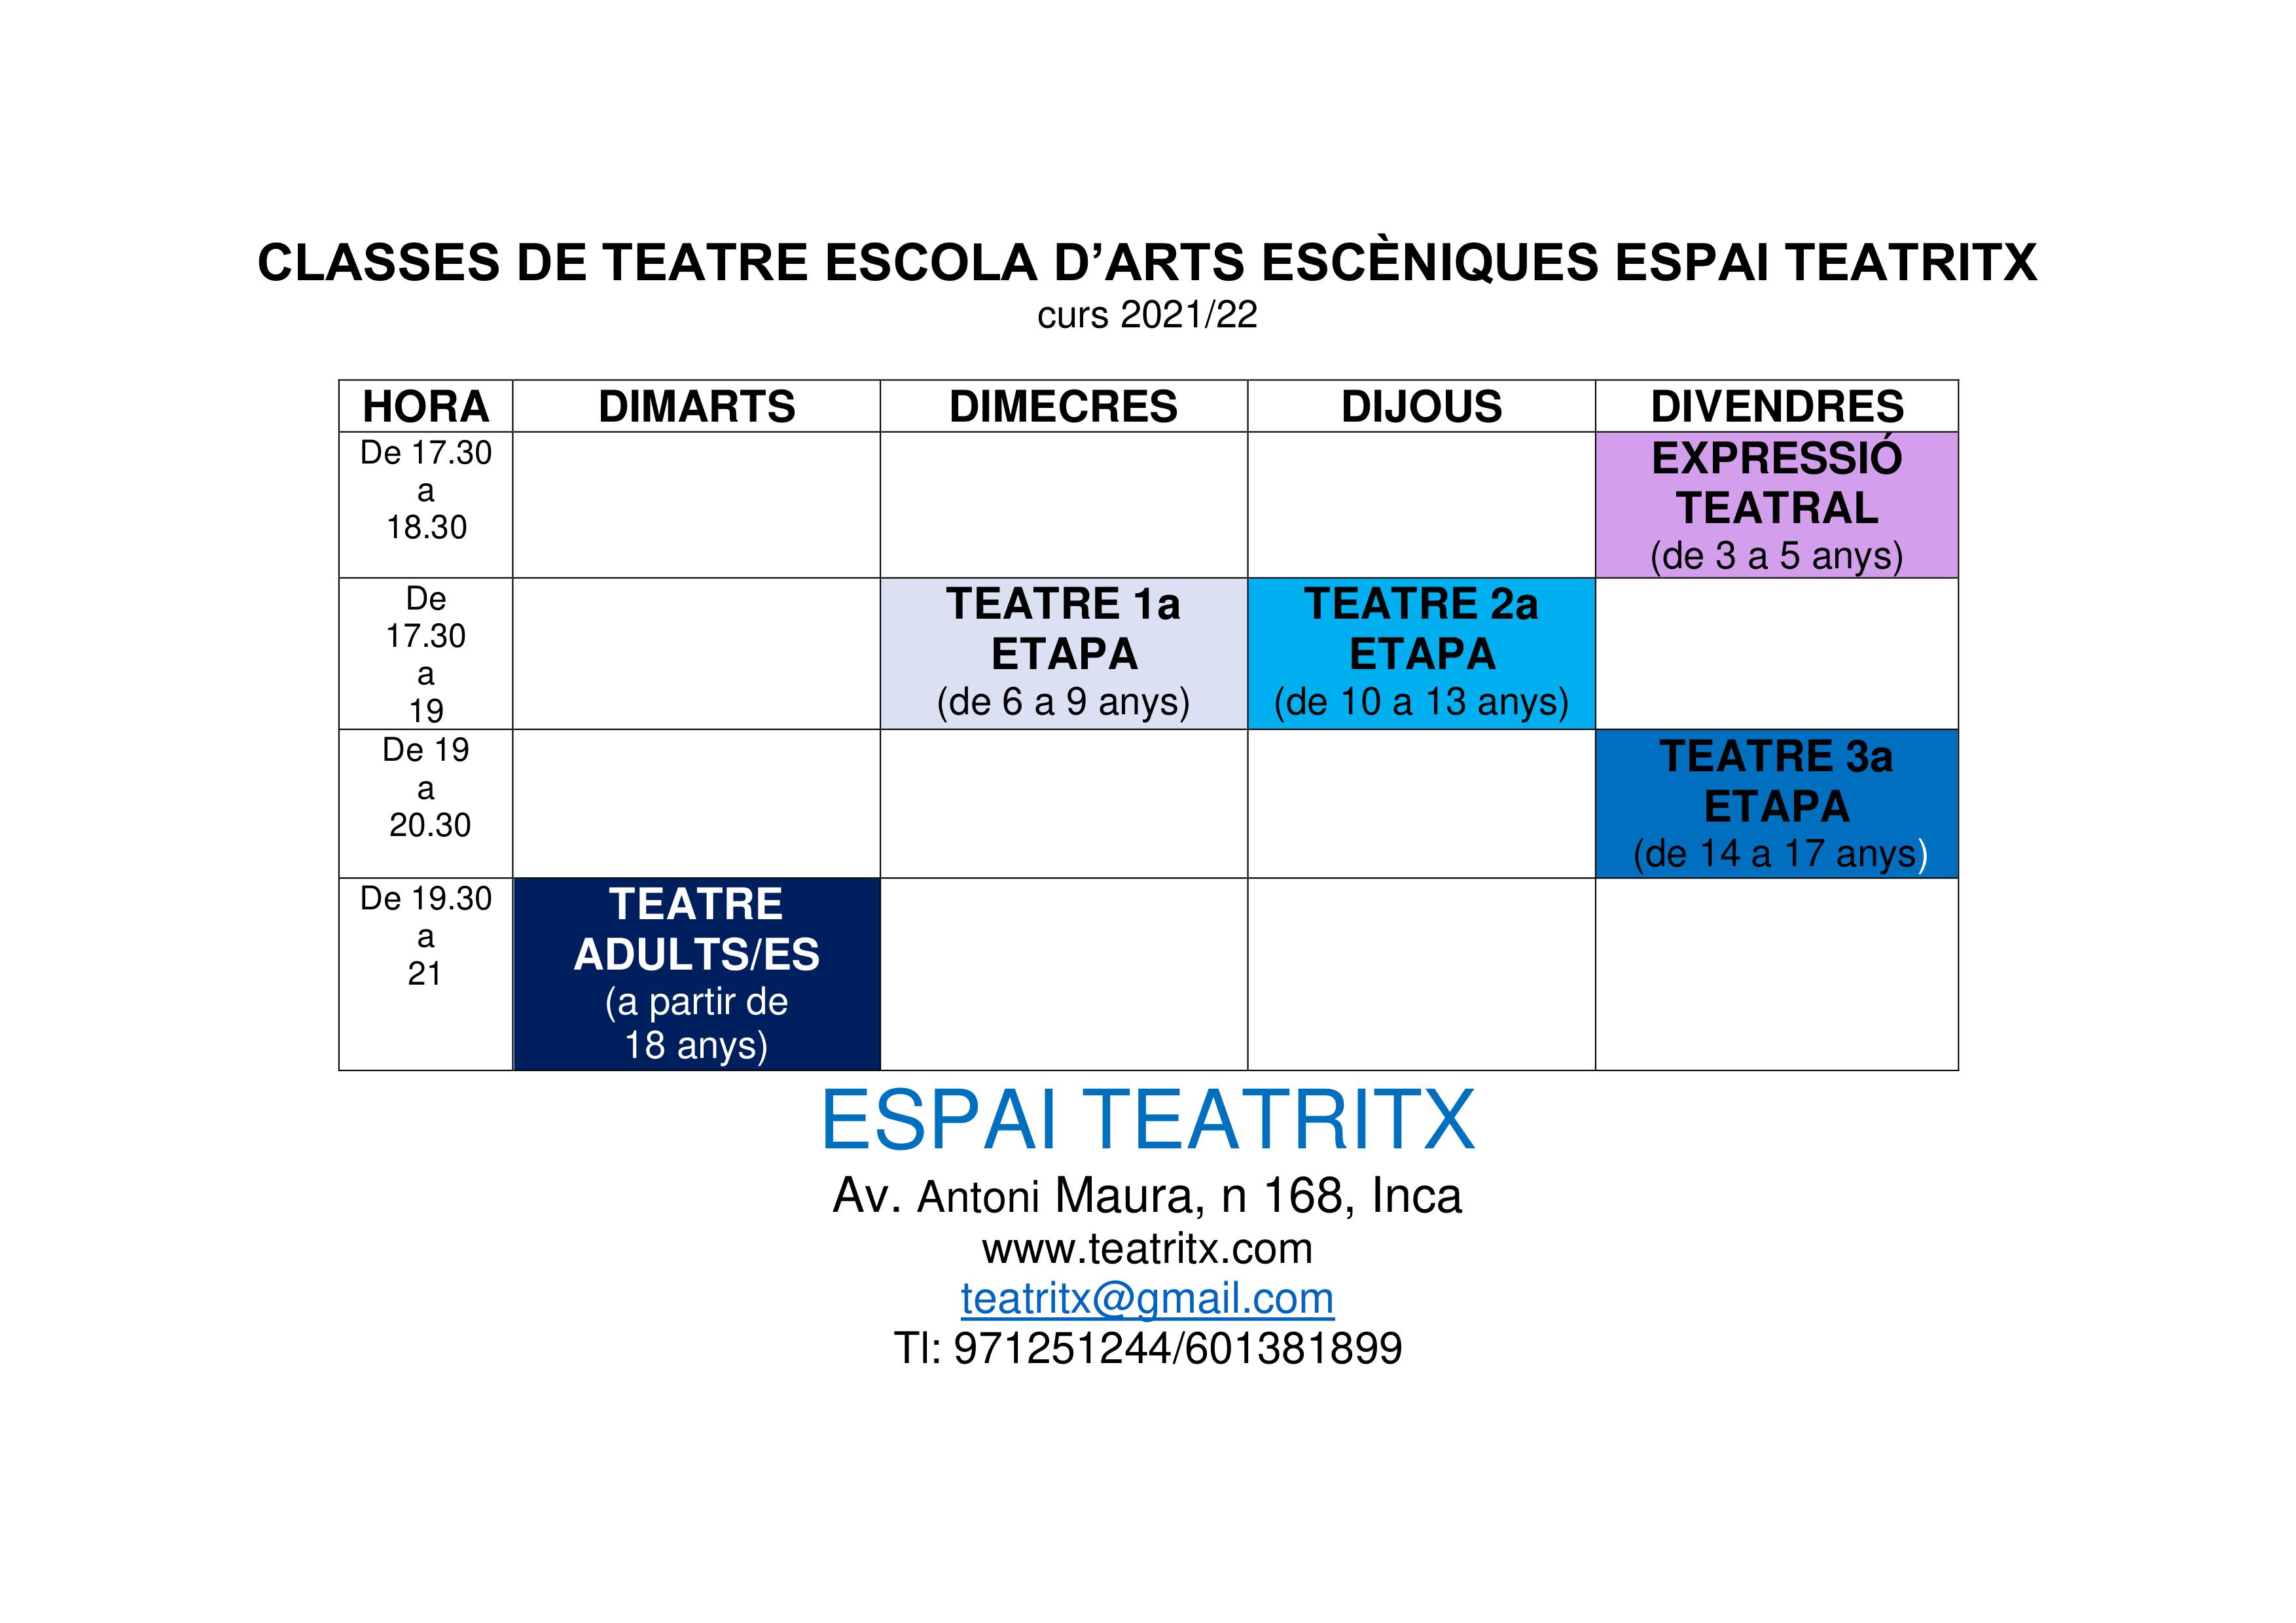 CLASSES DE TEATRE Curs 2021_22